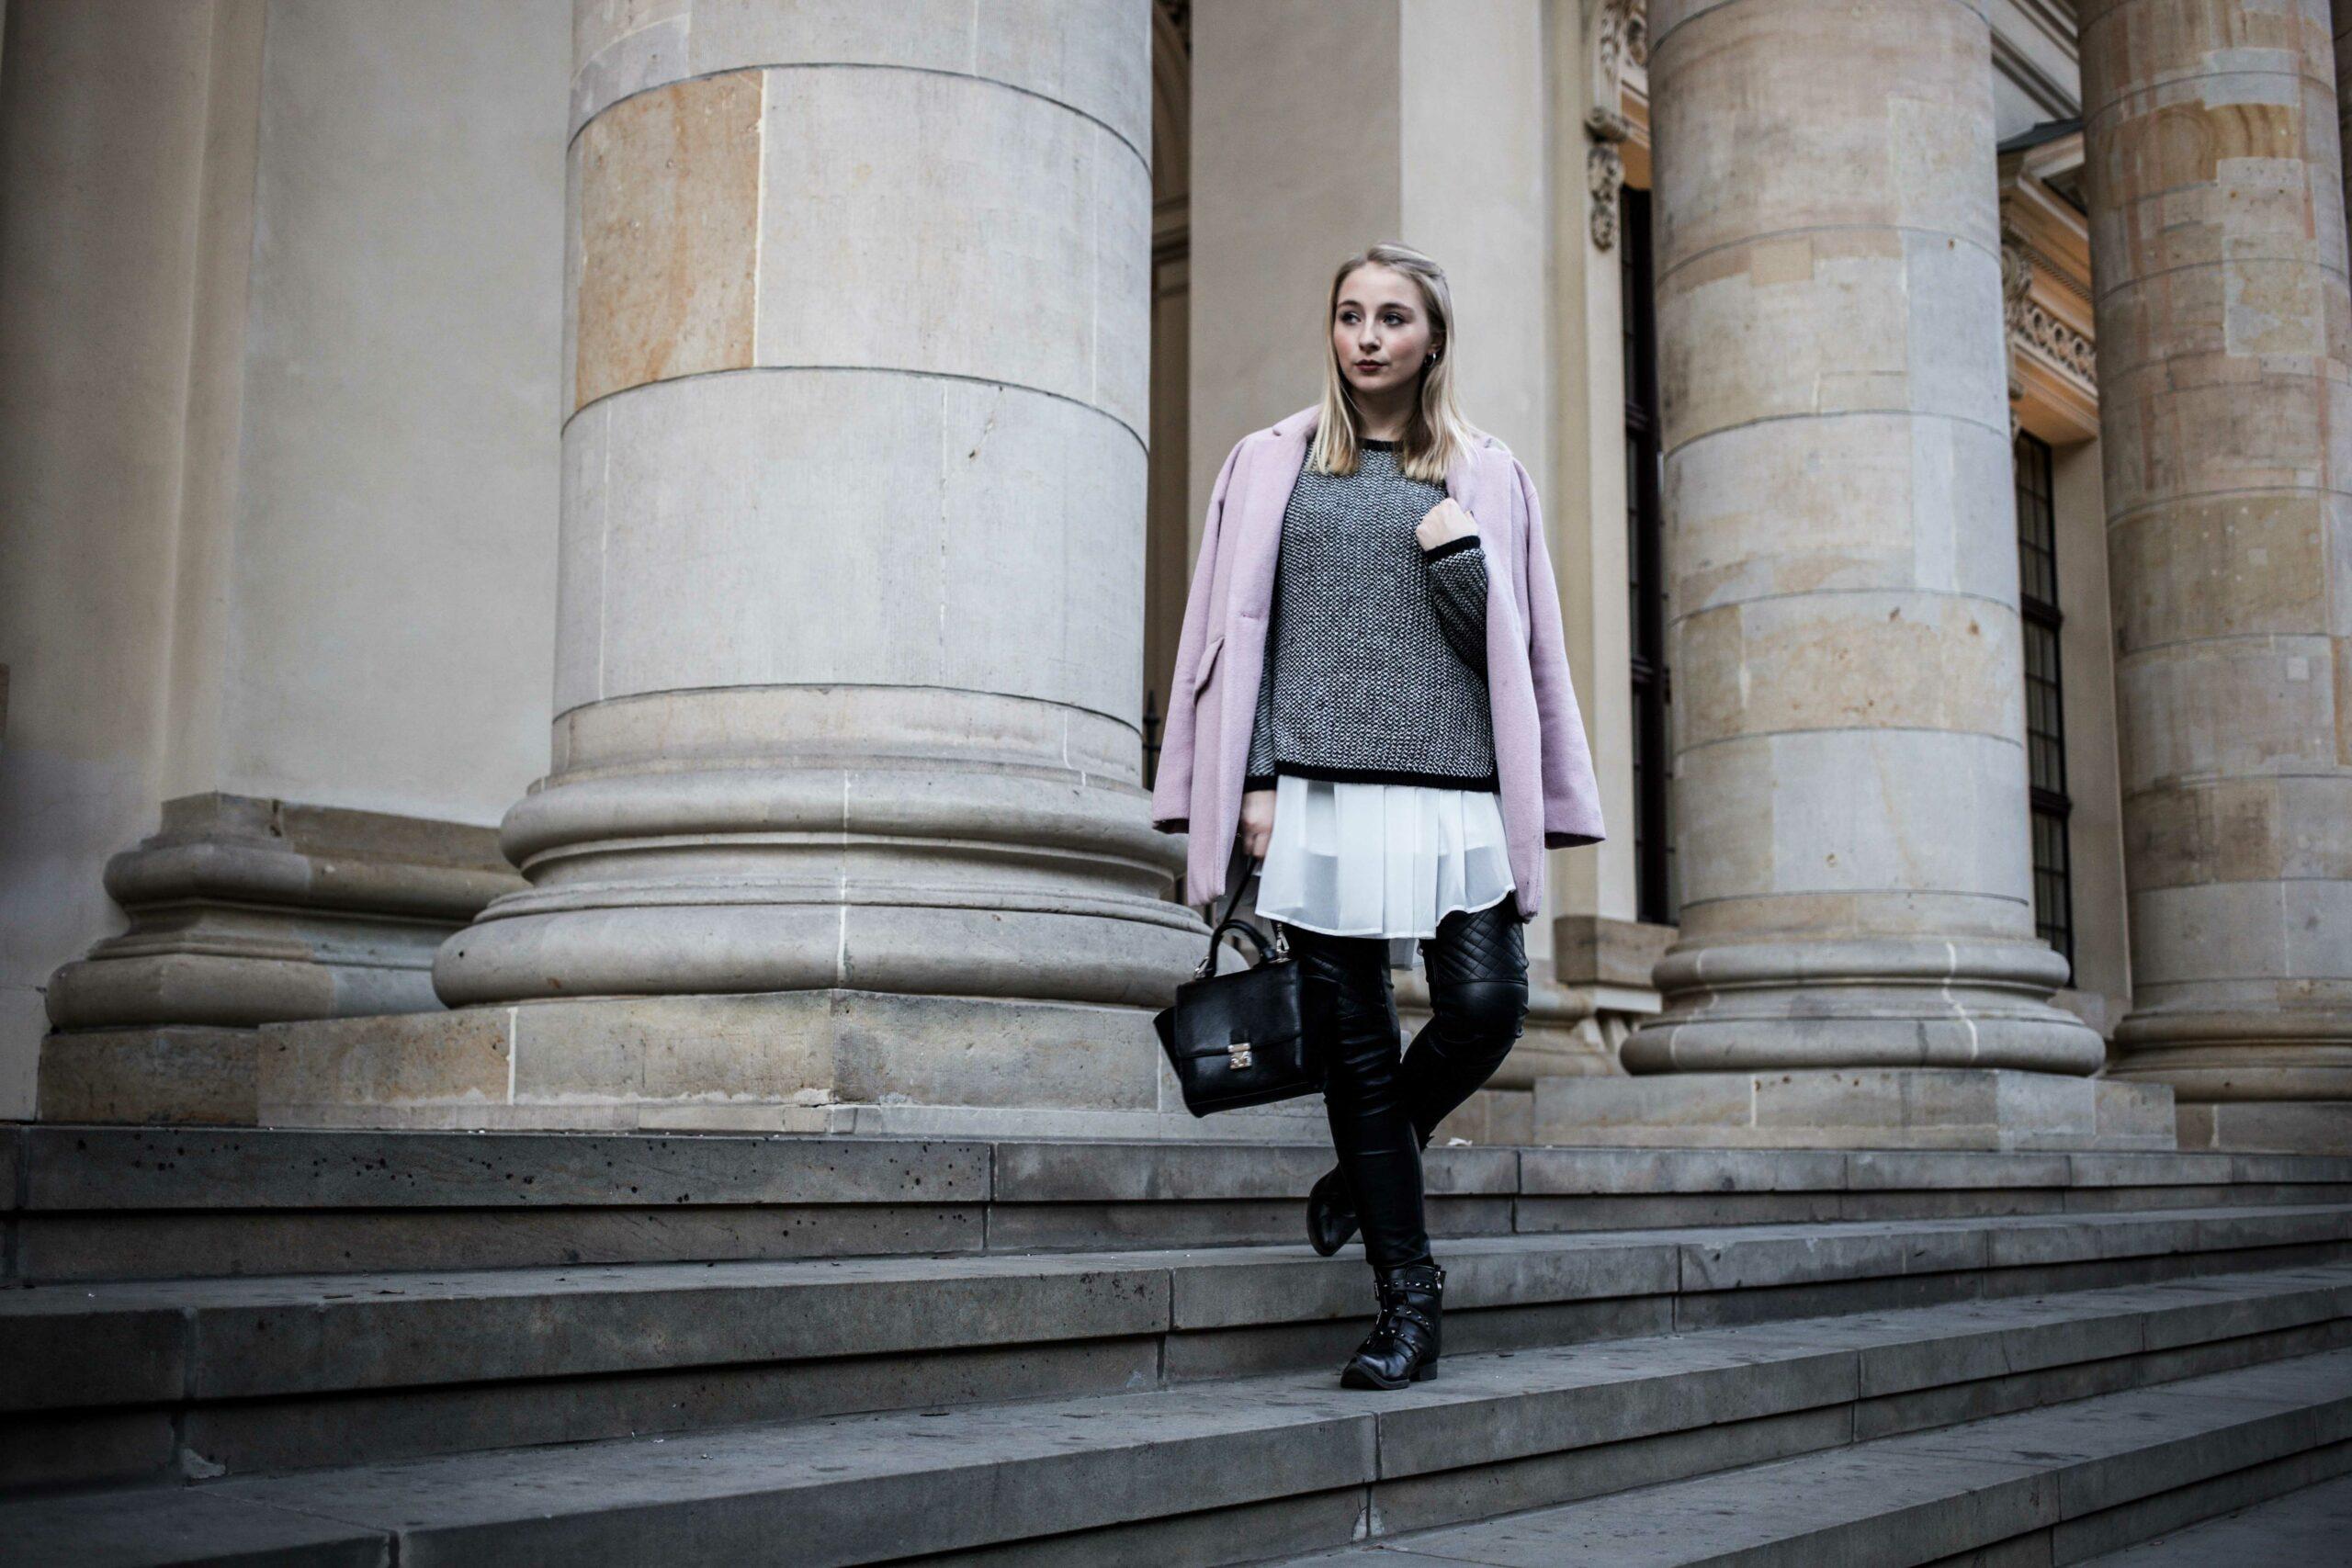 layering-outfit-biker-lederhose-thomas-sabo-schmuck-winter-outfit-berlin-fashionblog-modeblog_7514